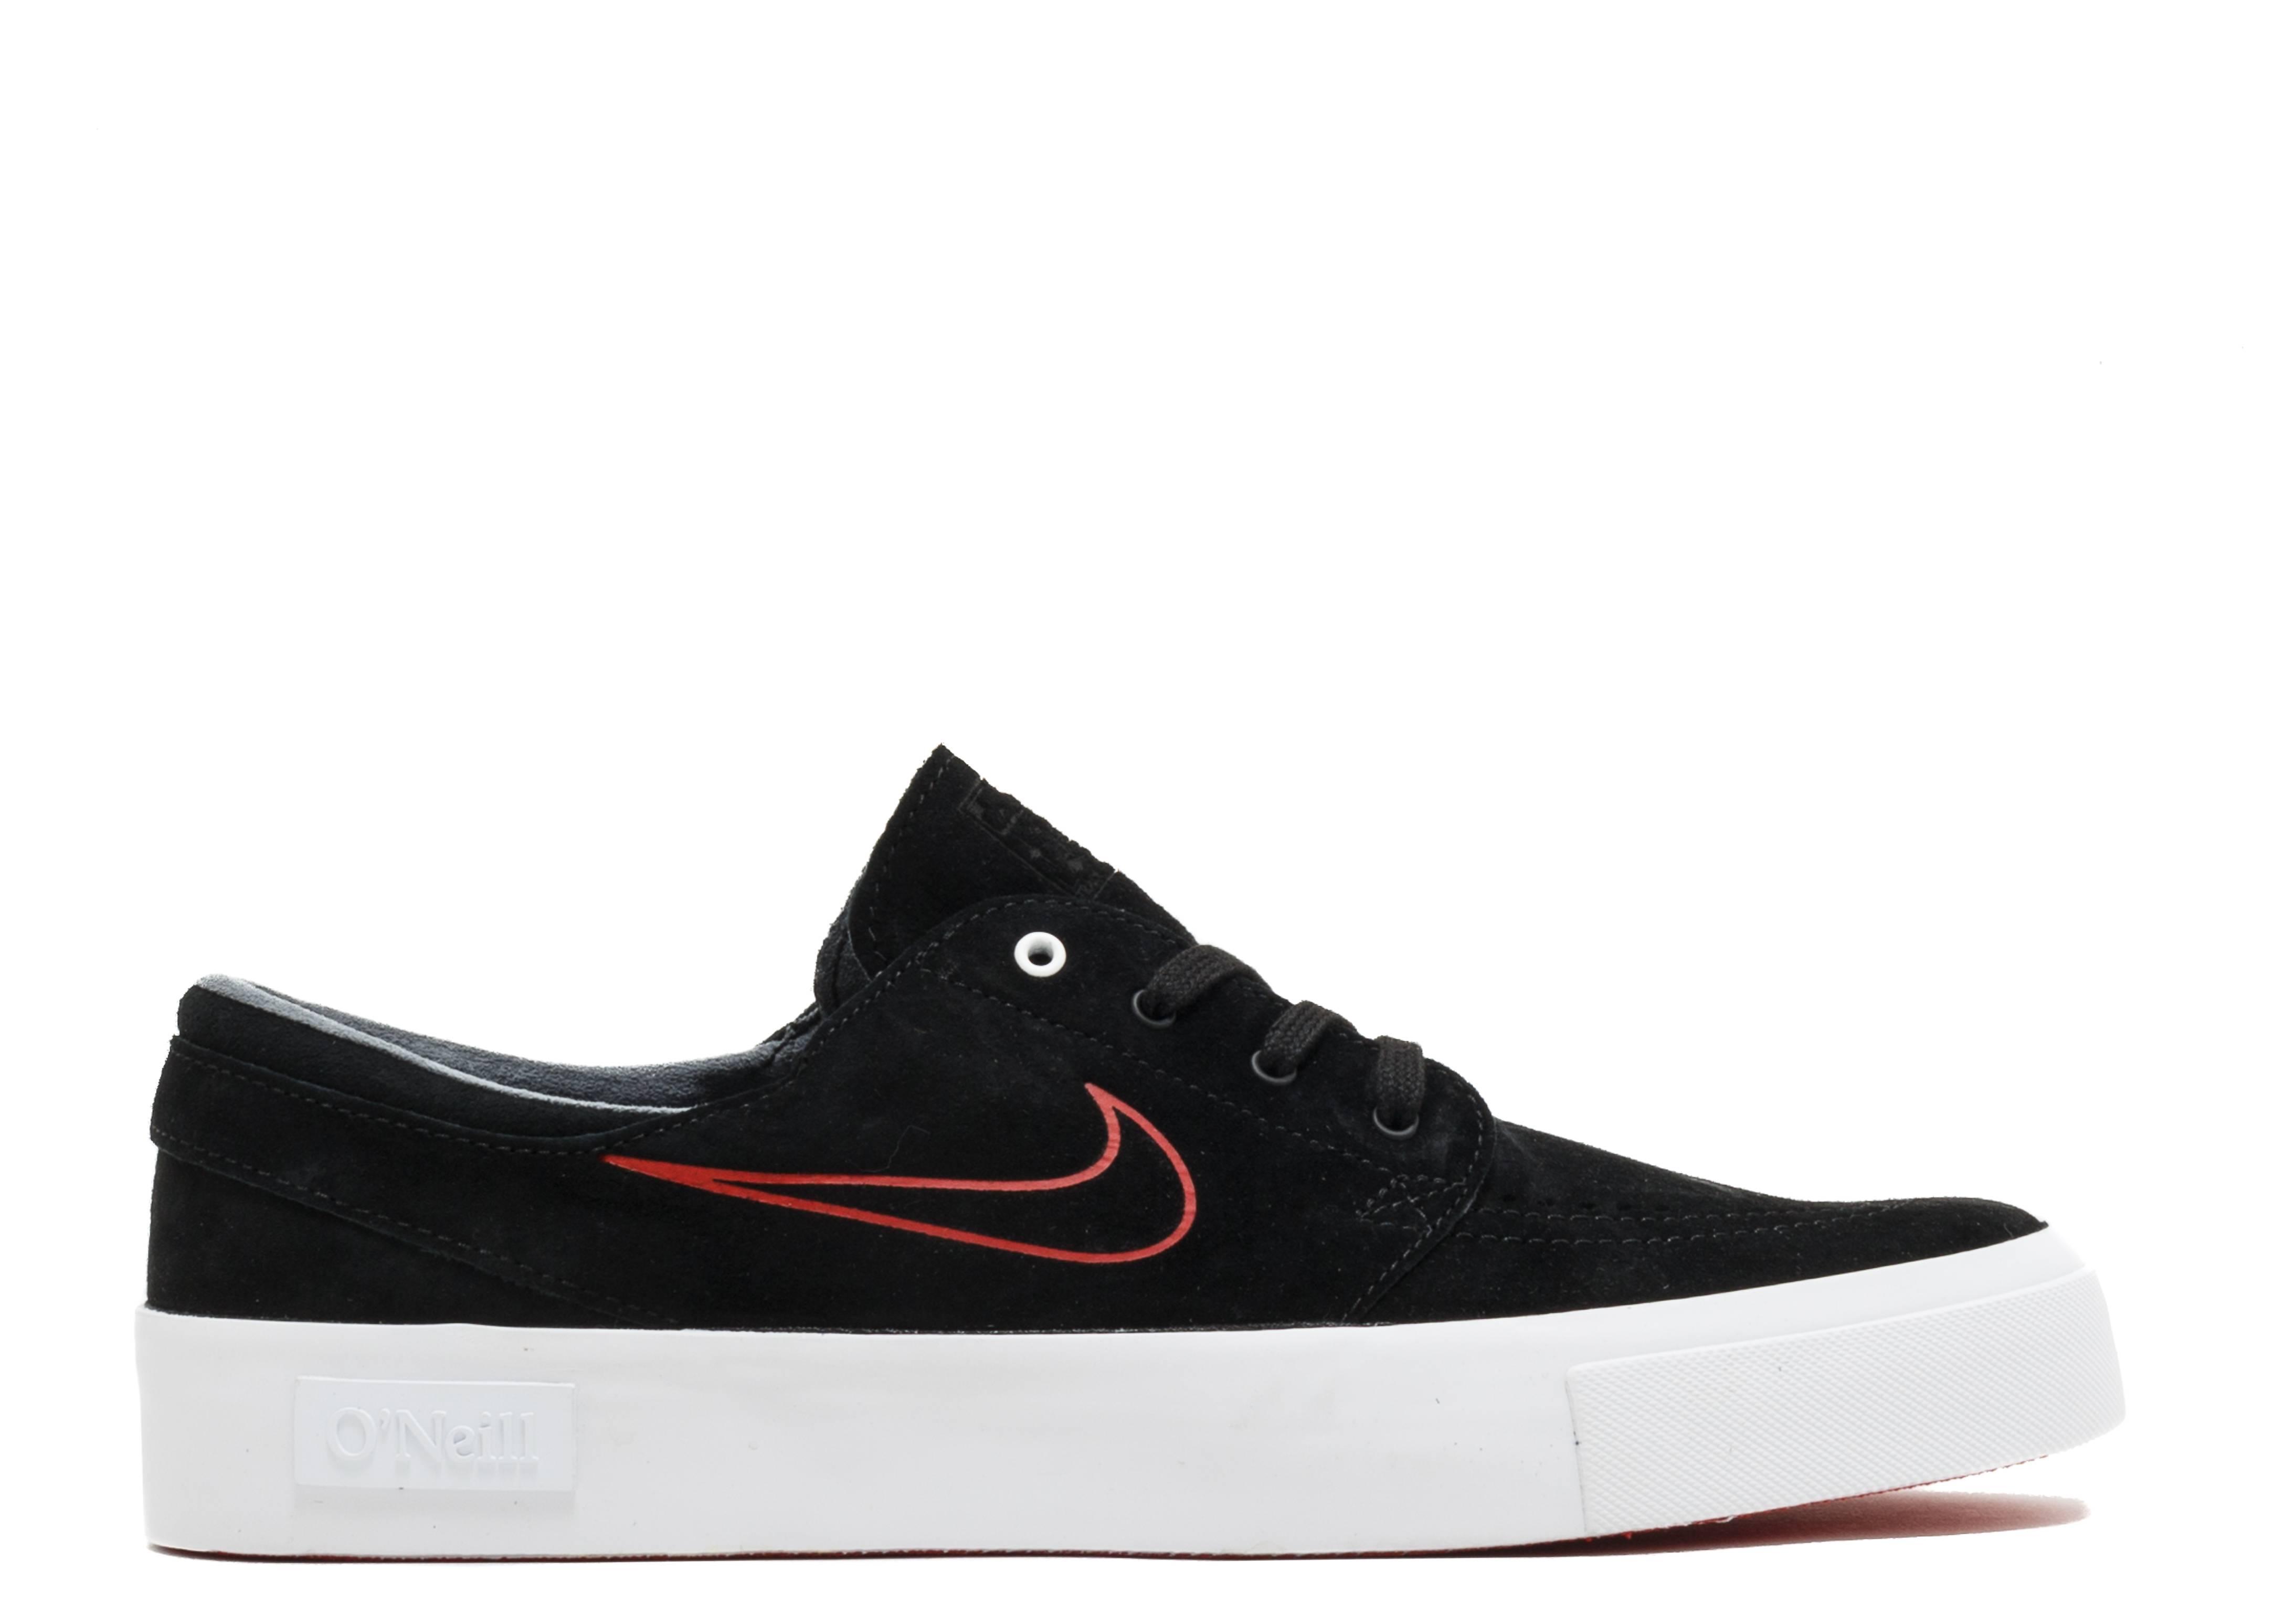 11s Rojo Nike Zoom Stefan Janoski Mediados Universitarios venta para barato CrO6L4m